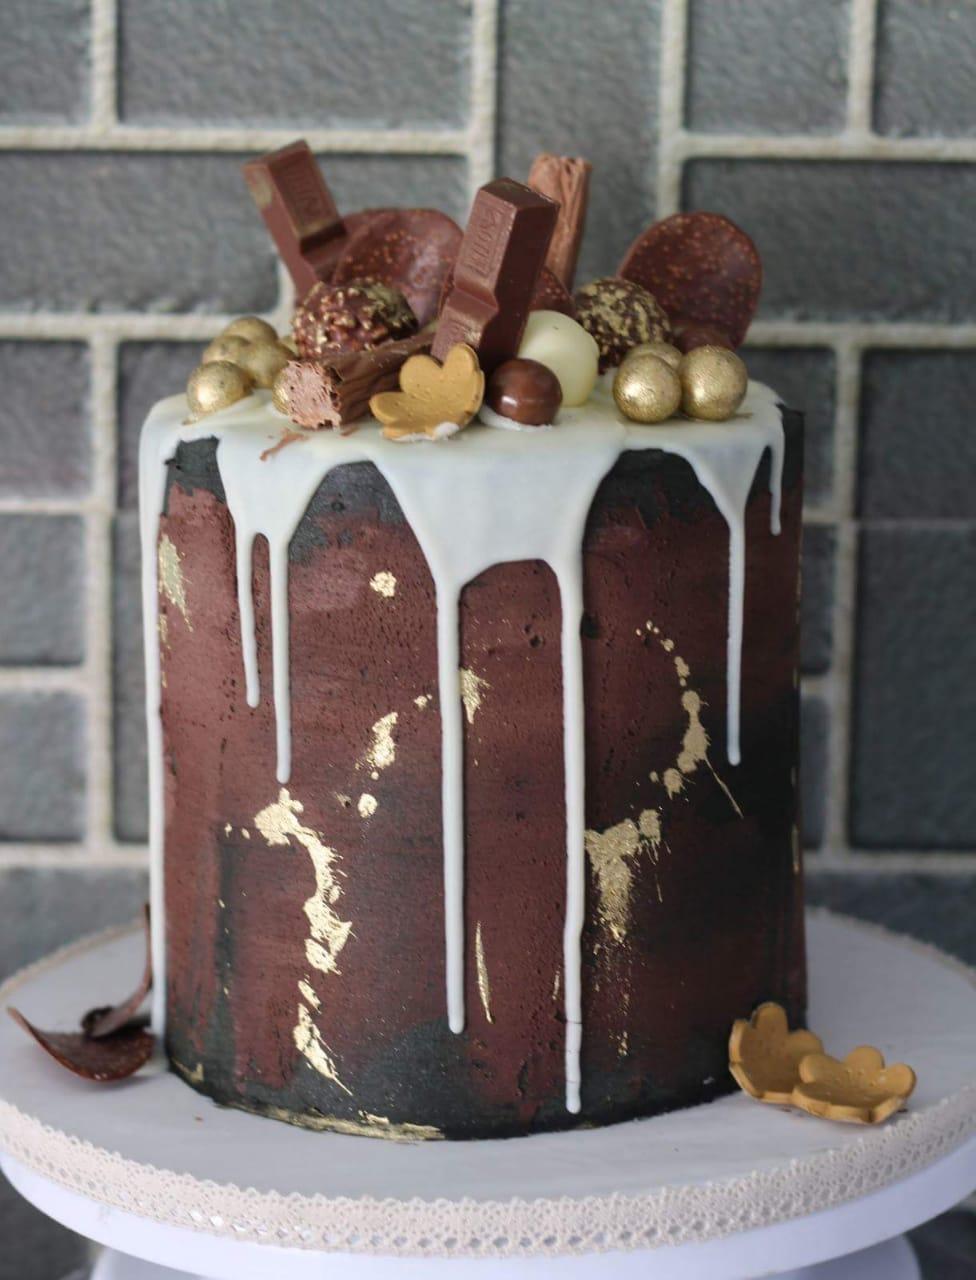 Cakes Johannesburg, cupcakes, cake pops, wedding cakes